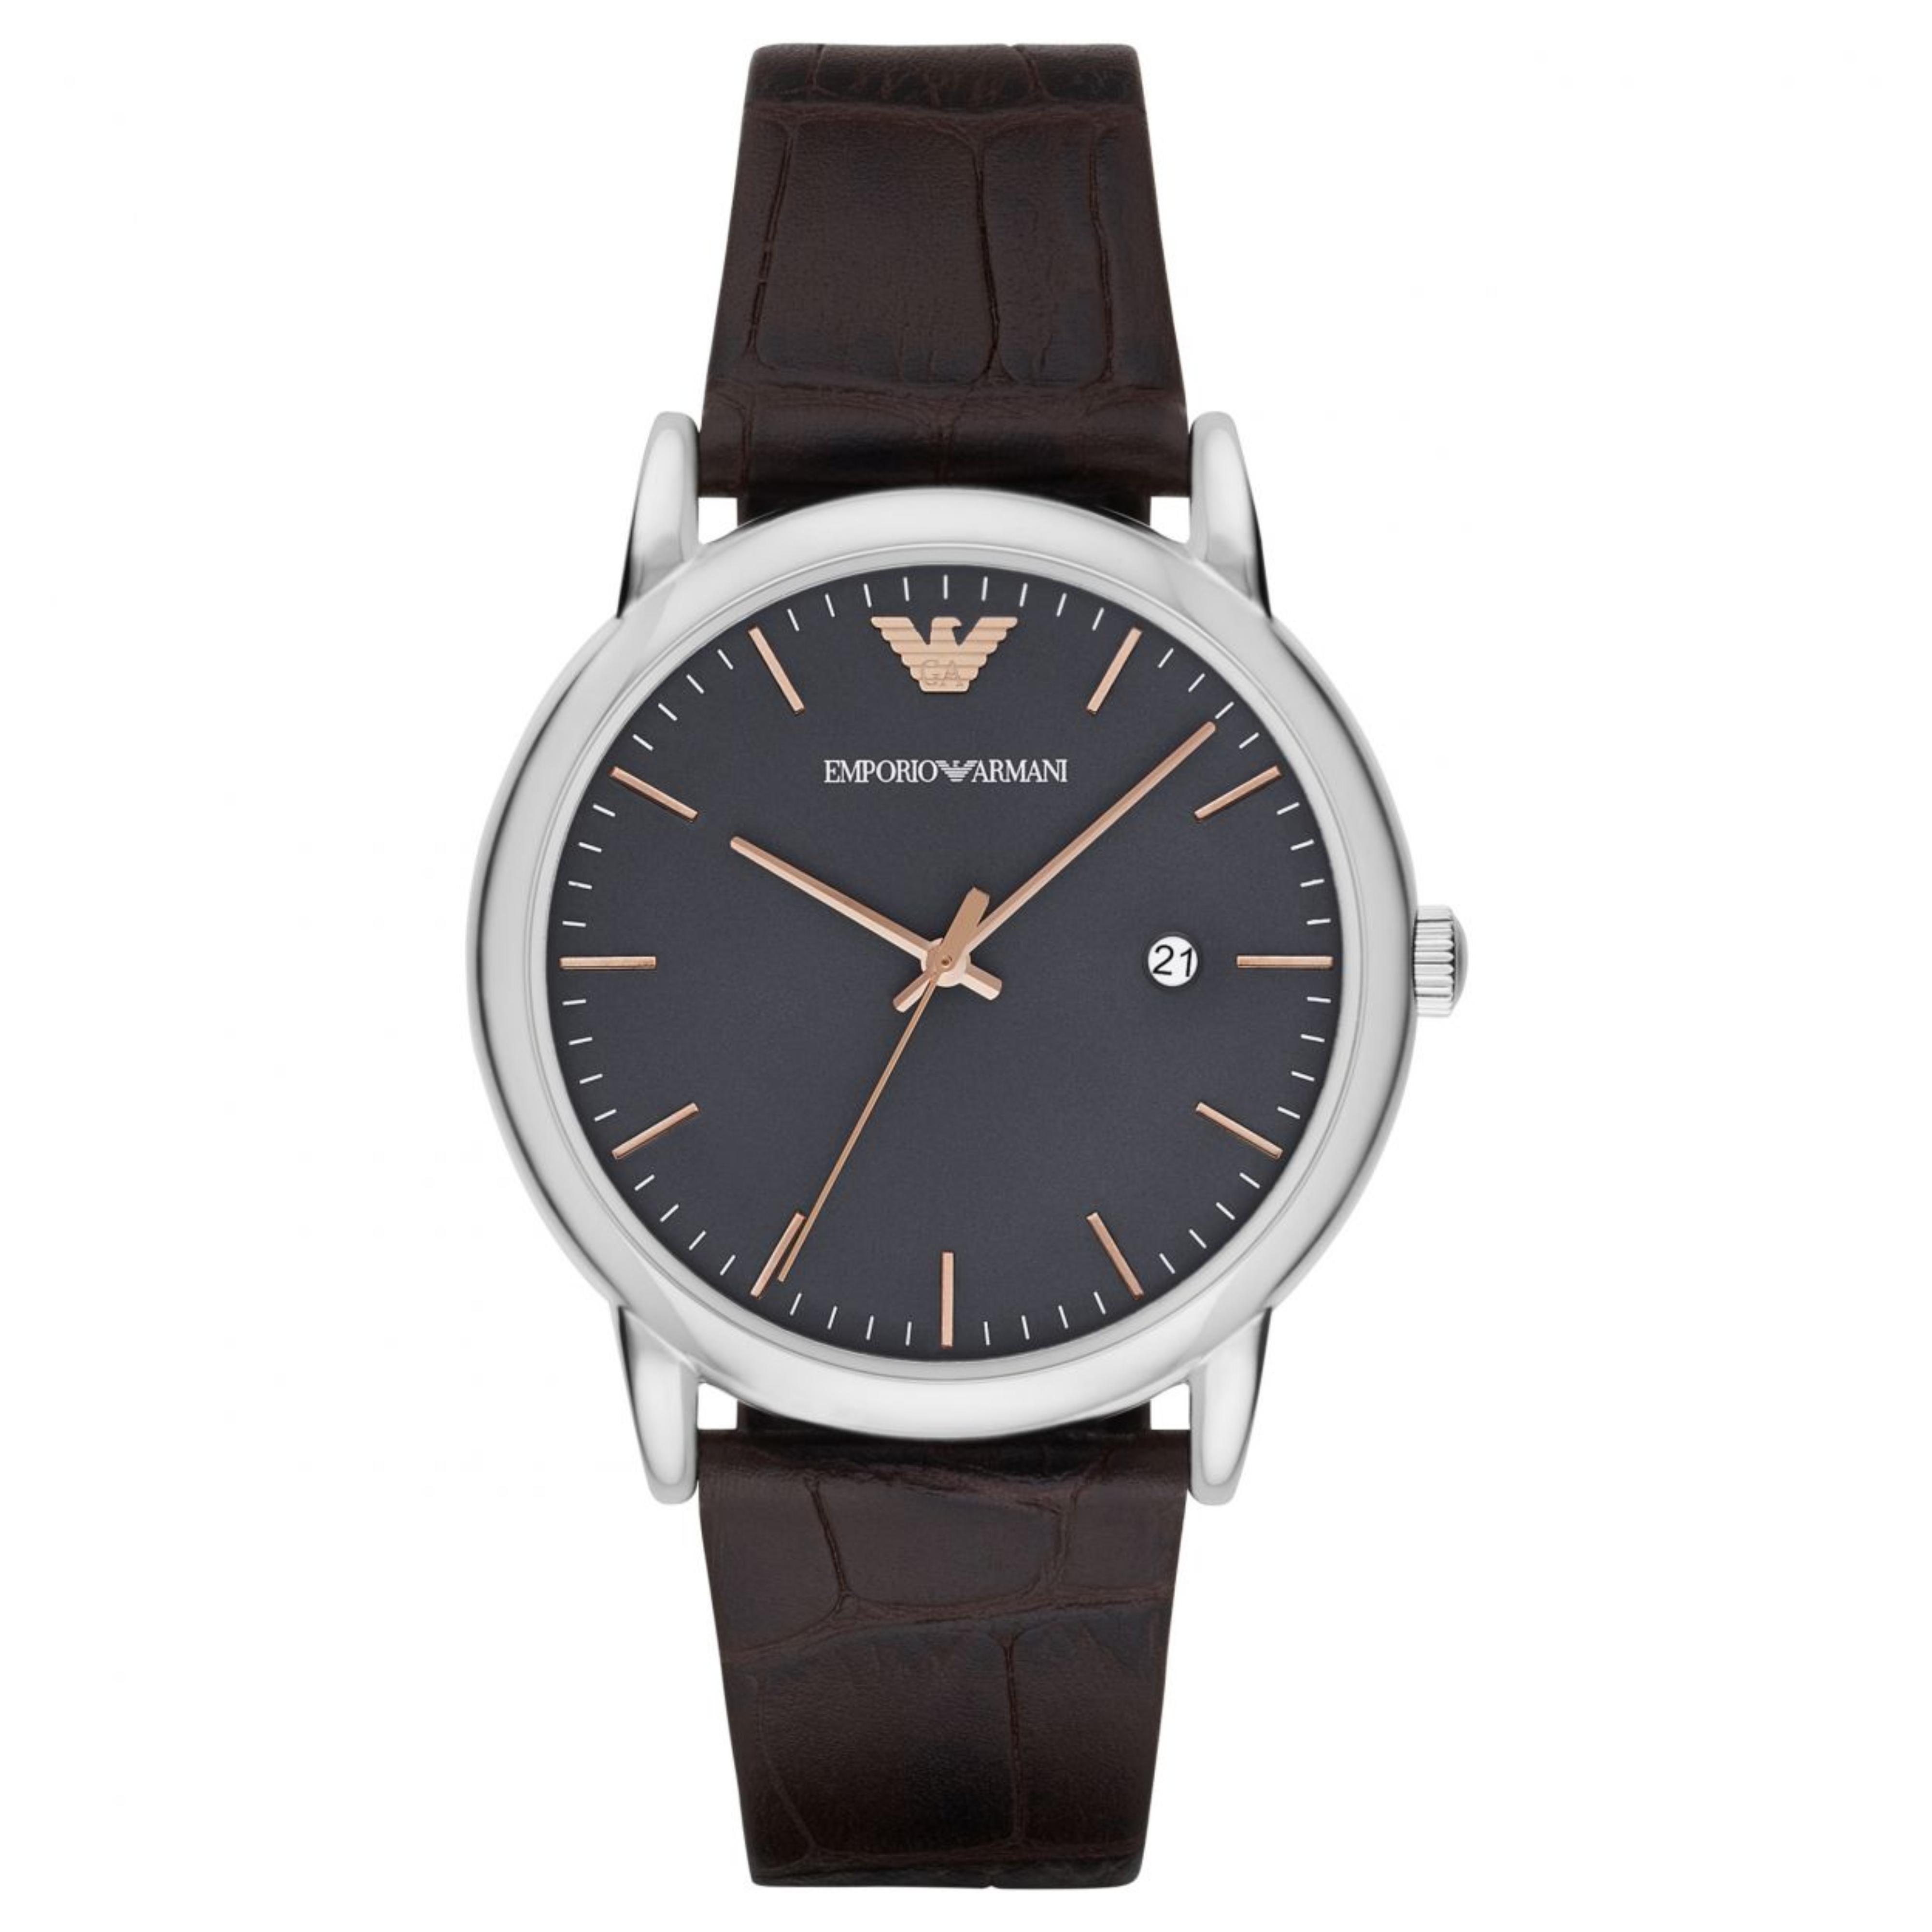 Emporio Armani Luigi Men's Watch | Grey Round Dial | Dark Brown Leather Strap | AR1996